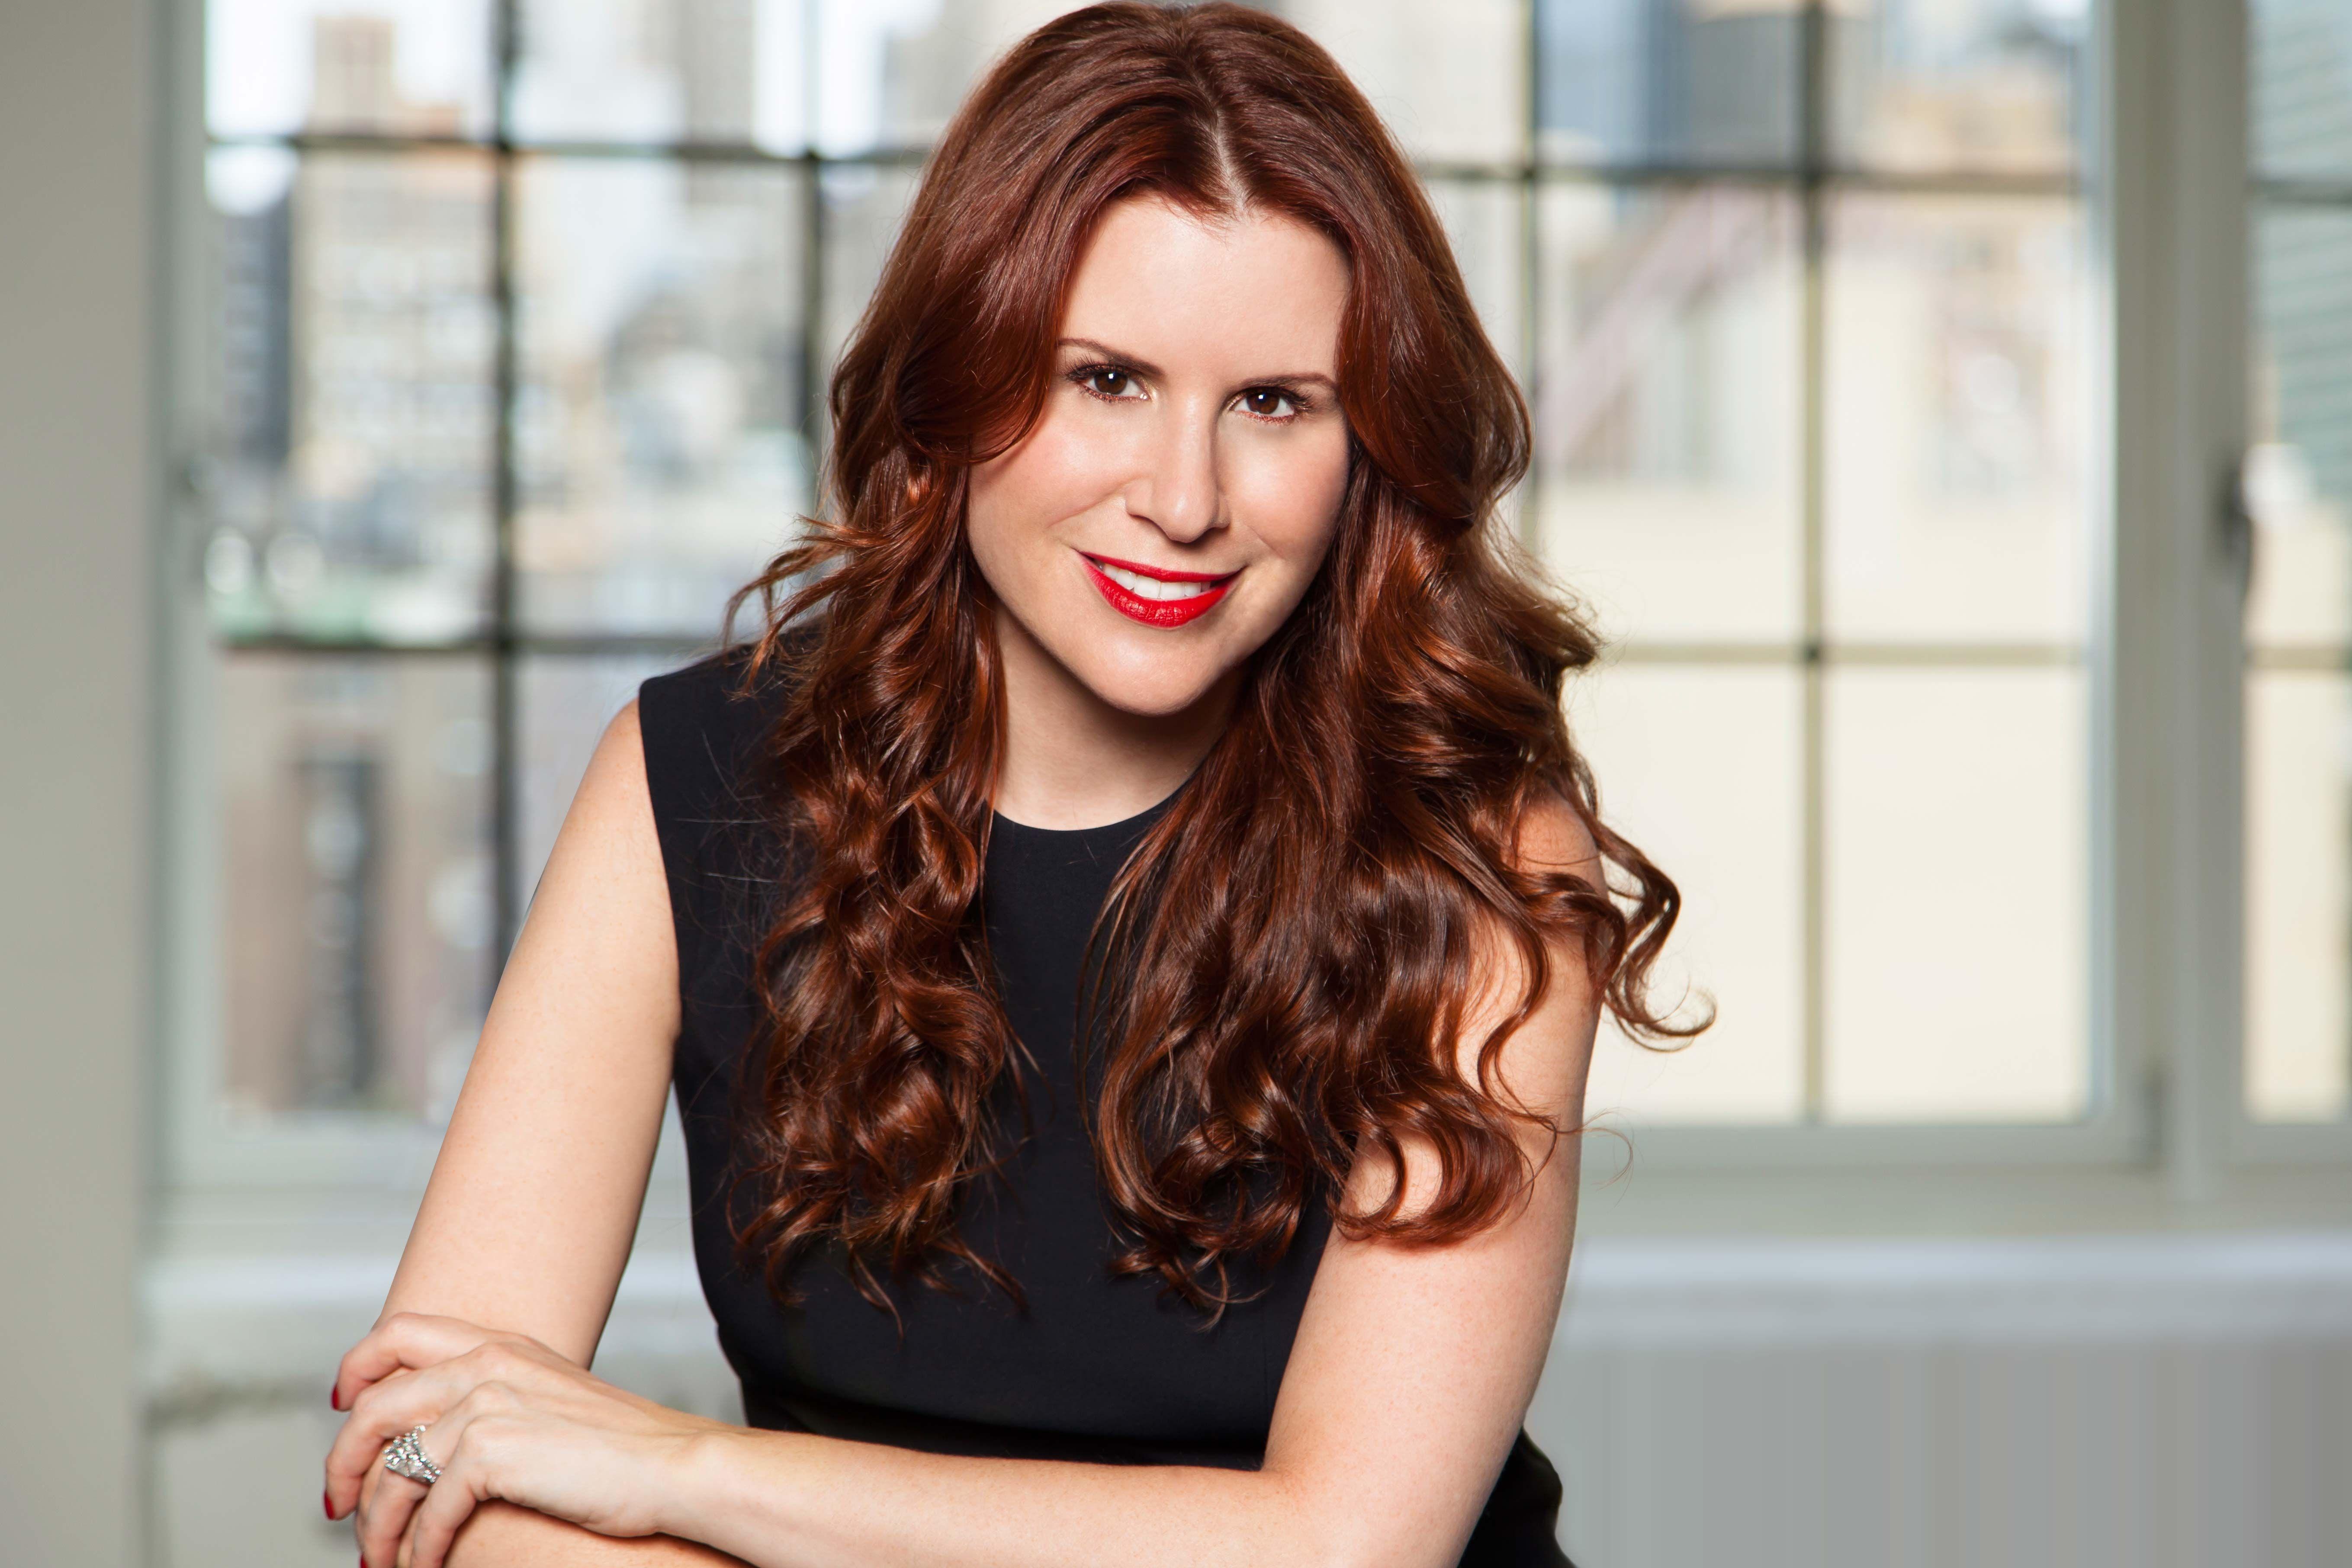 DKNY PR Girl Aliza Licht's Top 5 EntertainingTips forecasting